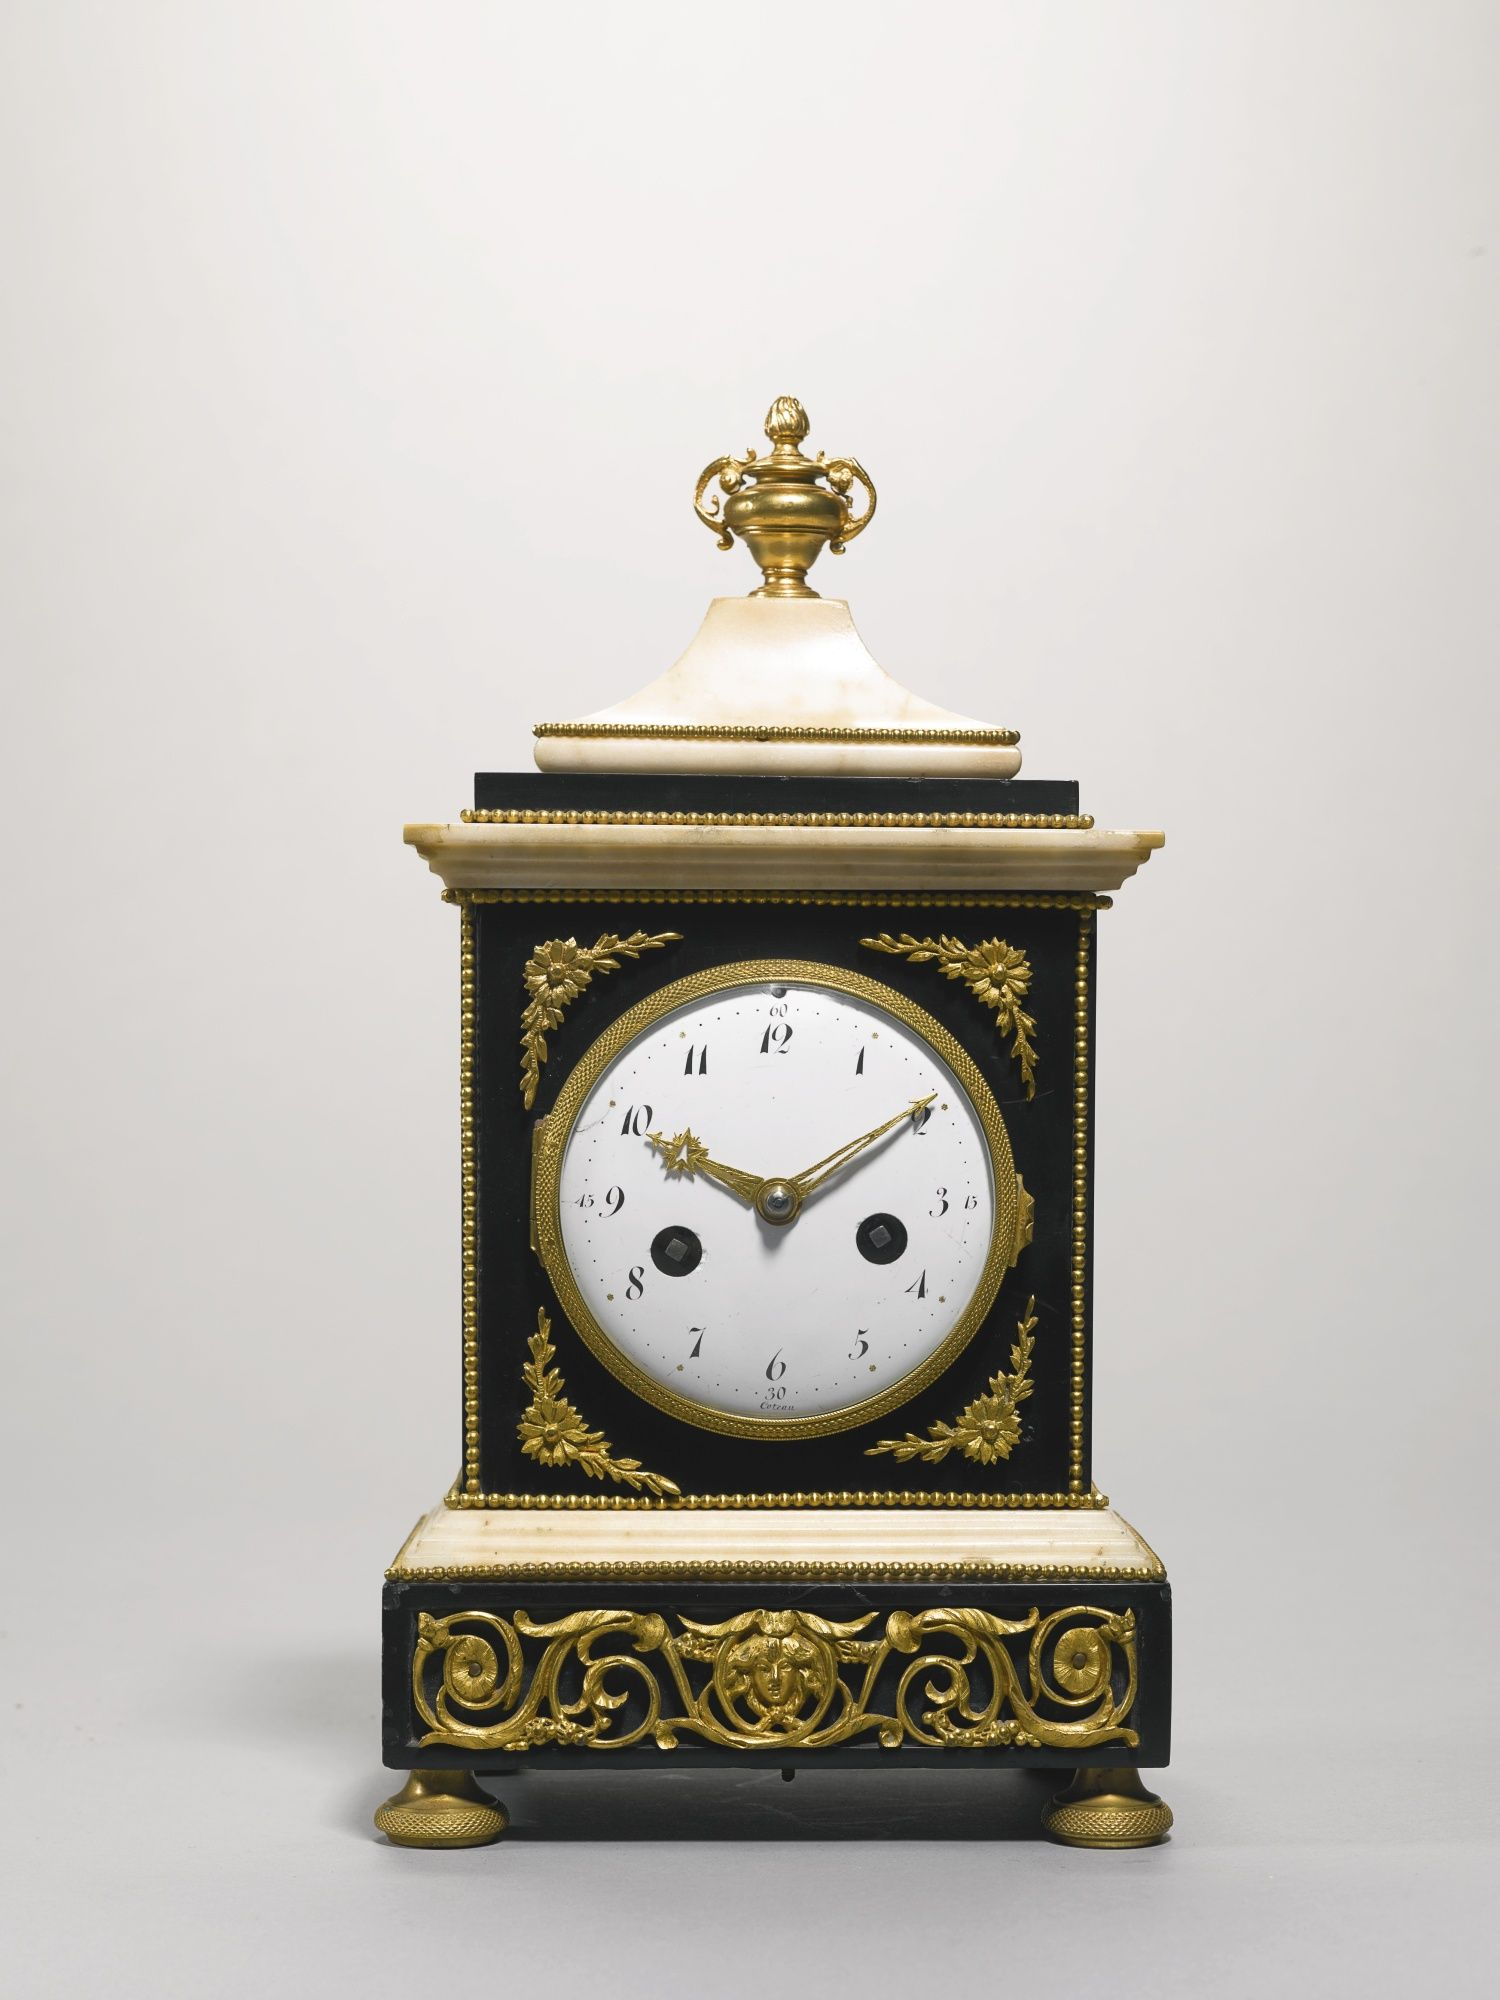 C1800 An Empire Black And White Marble Mantel Clock Circa 1800 Estimate 2 000 3 000 Gbp 3 047 4 571usd Lot S Black And White Marble Mantel Clock Mantel